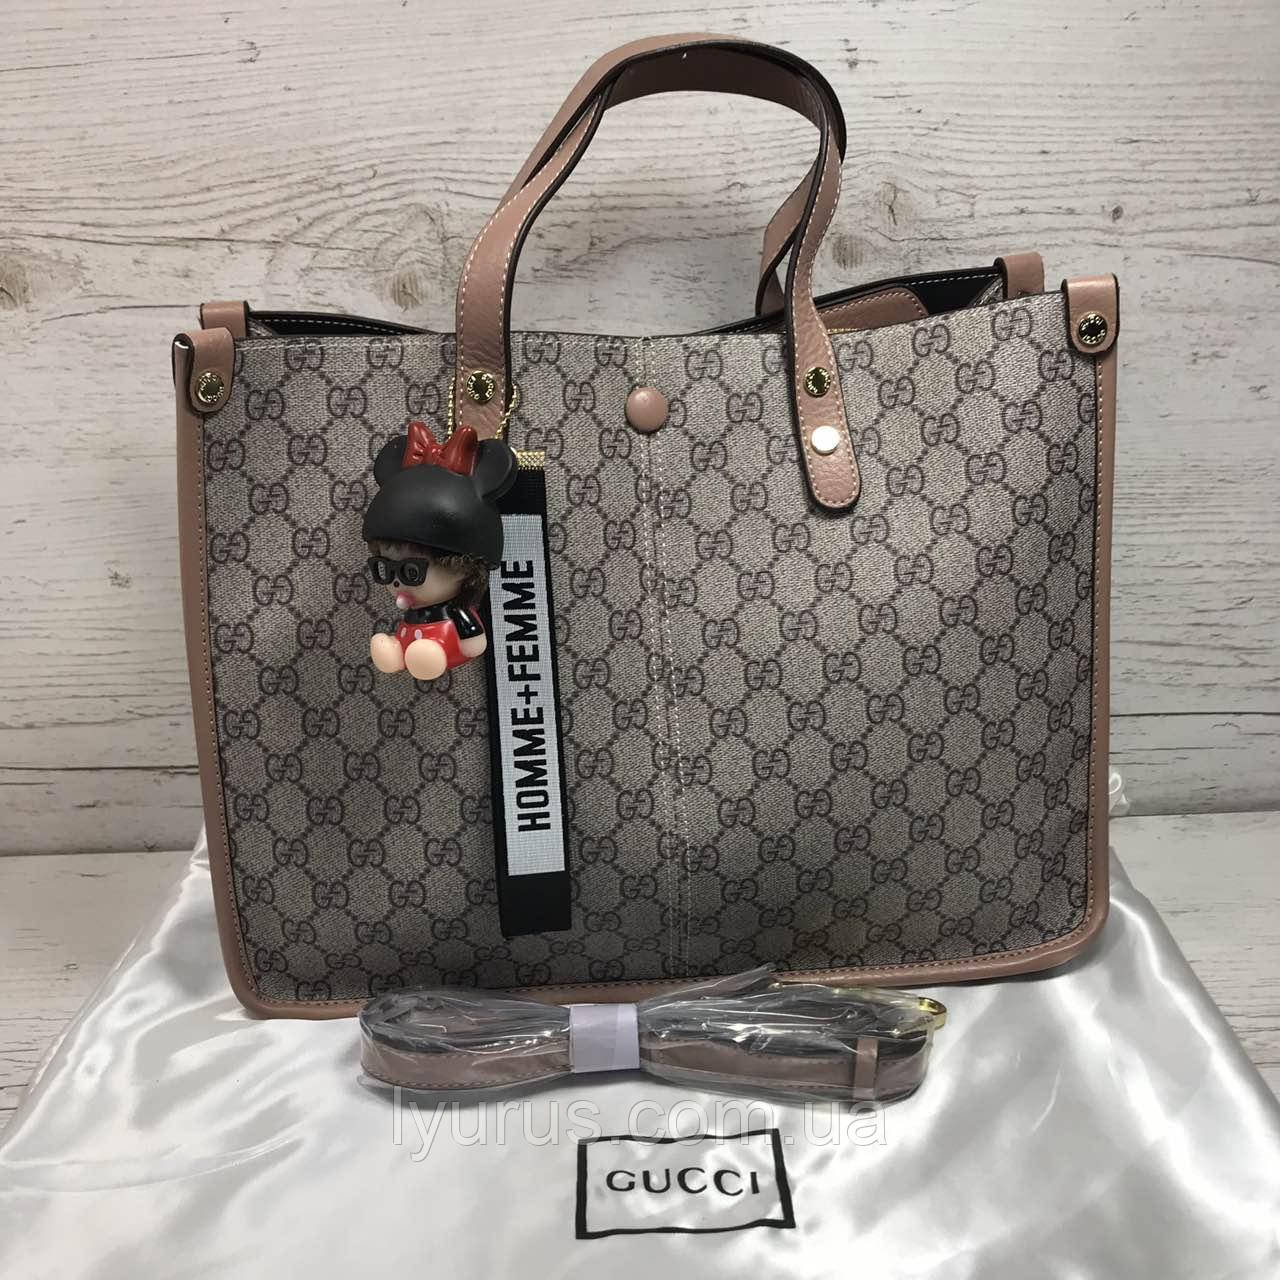 1dddfba7d5e1 Женская сумка Gucci Гуччи: продажа, цена в Полтаве. женские сумочки ...